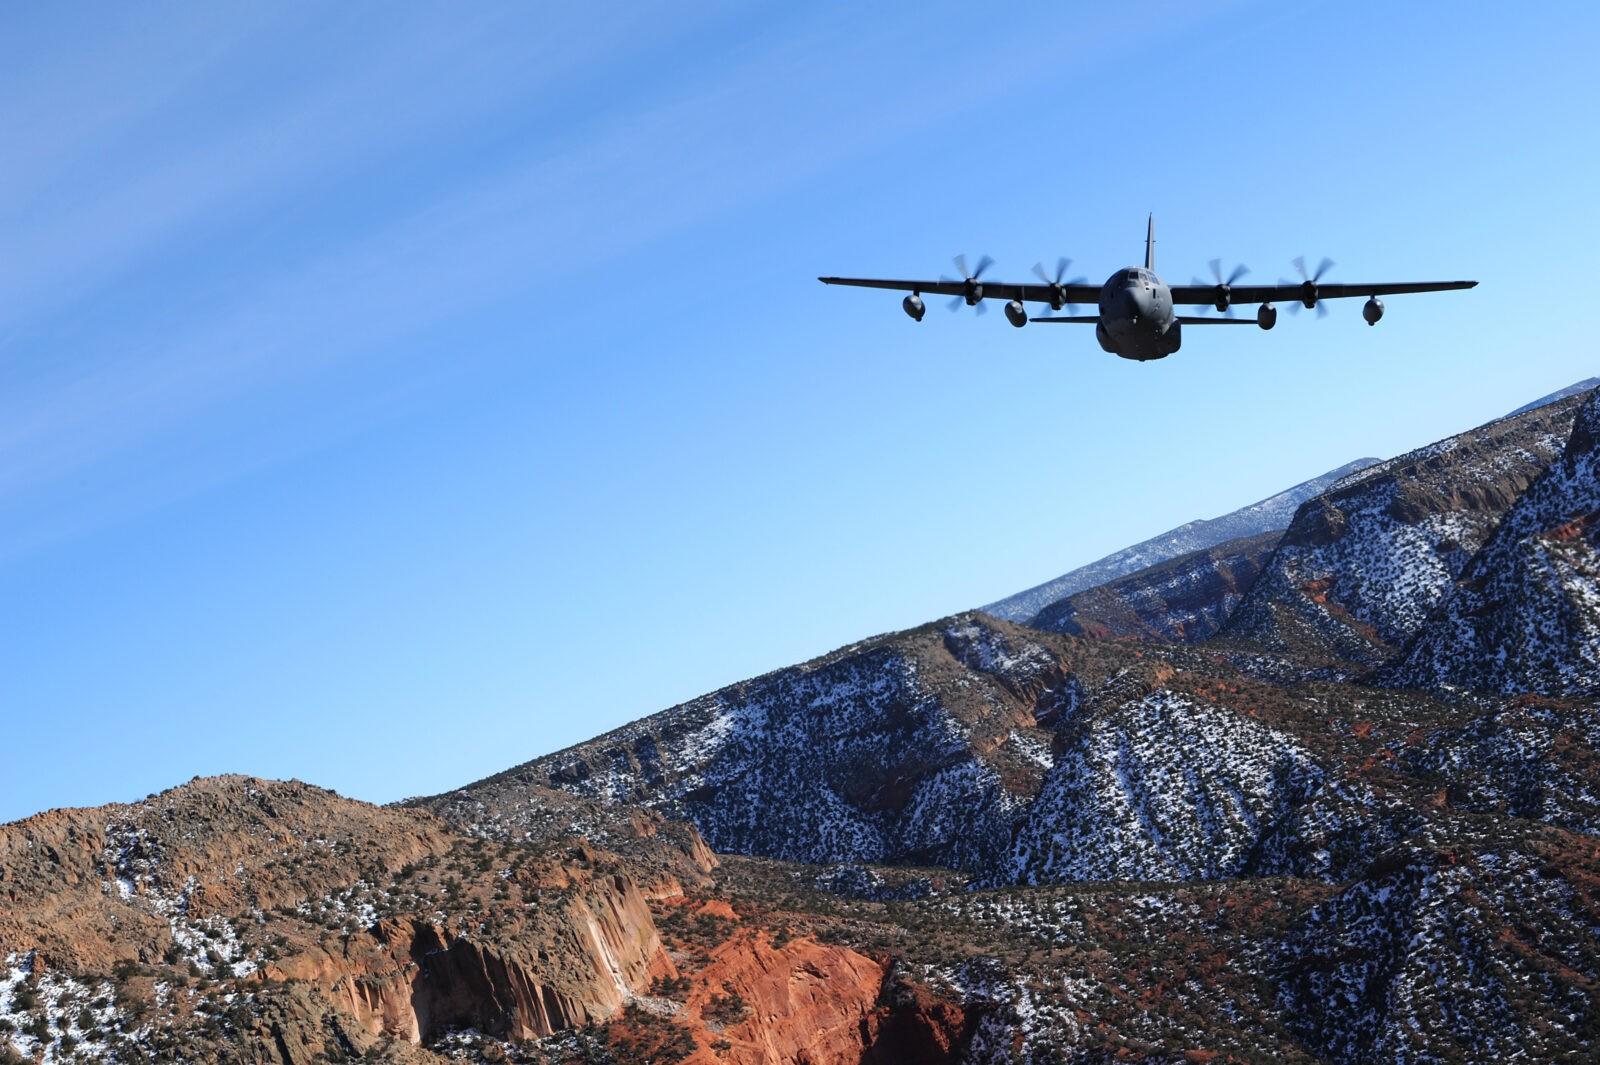 MC-130J Combat Shadow II